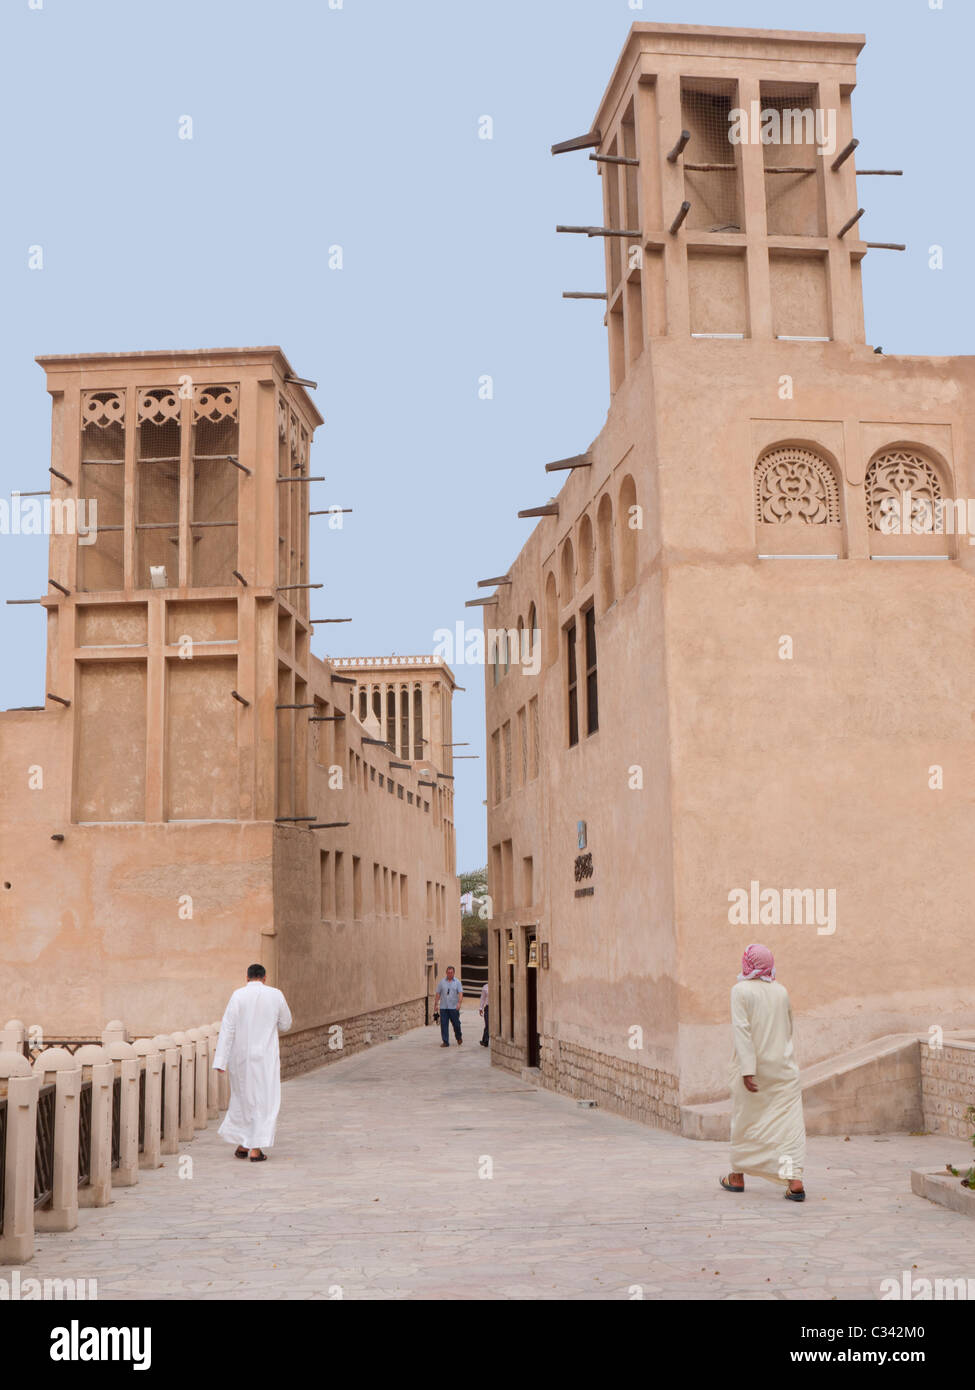 Bastakia or Al Bastakiya Quarter Bur Dubai, Dubai, United Arab Emirates, UAE - Stock Image